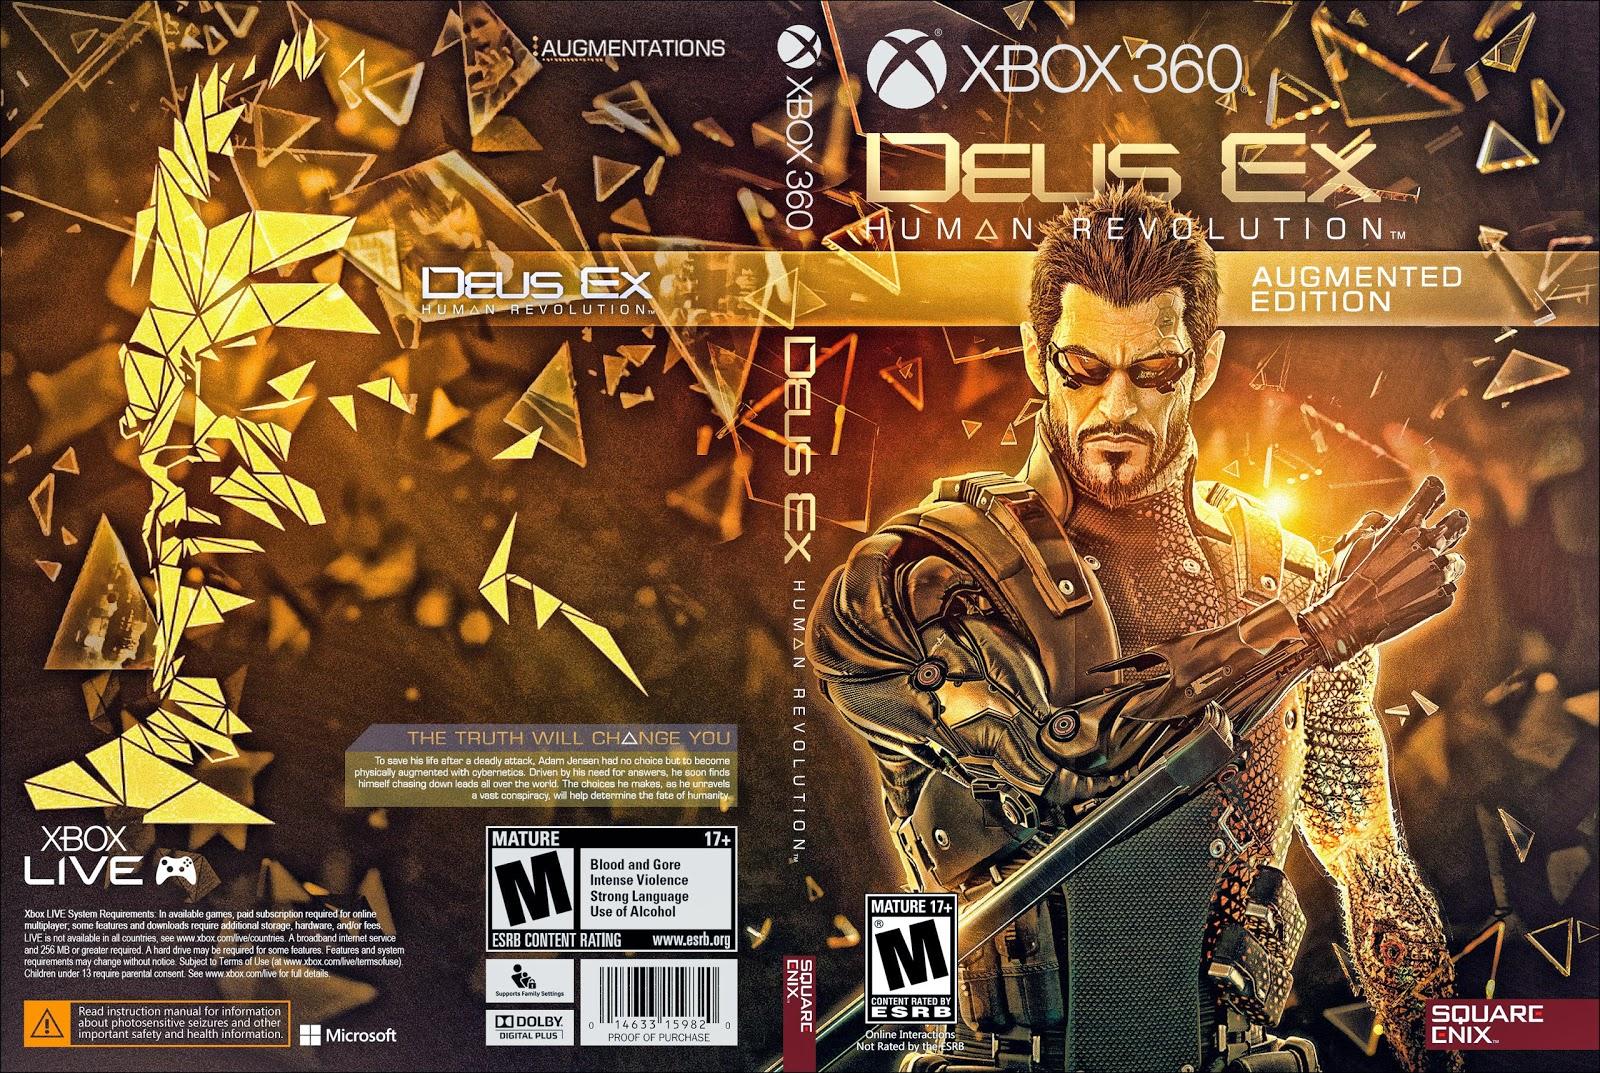 Capa Deus Ex Human Revolution Argumented Edition Xbox 360